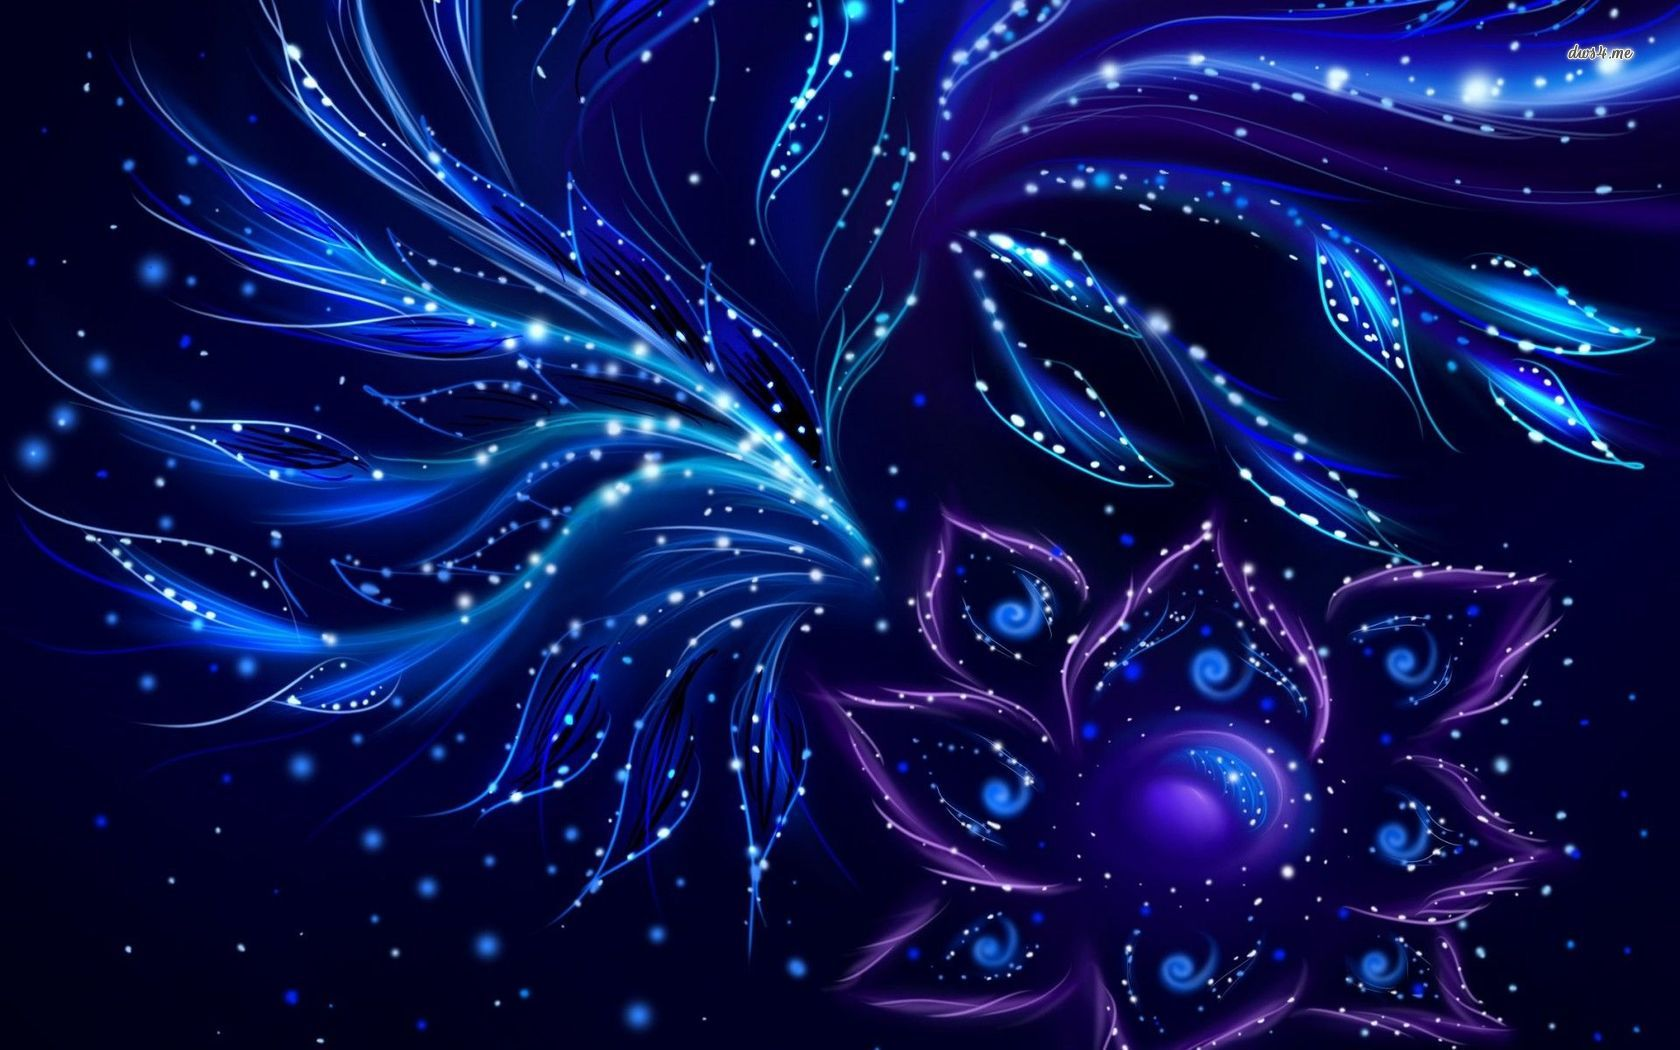 Download Glow In The Dark Wallpaper Hd Backgrounds Download Itl Cat